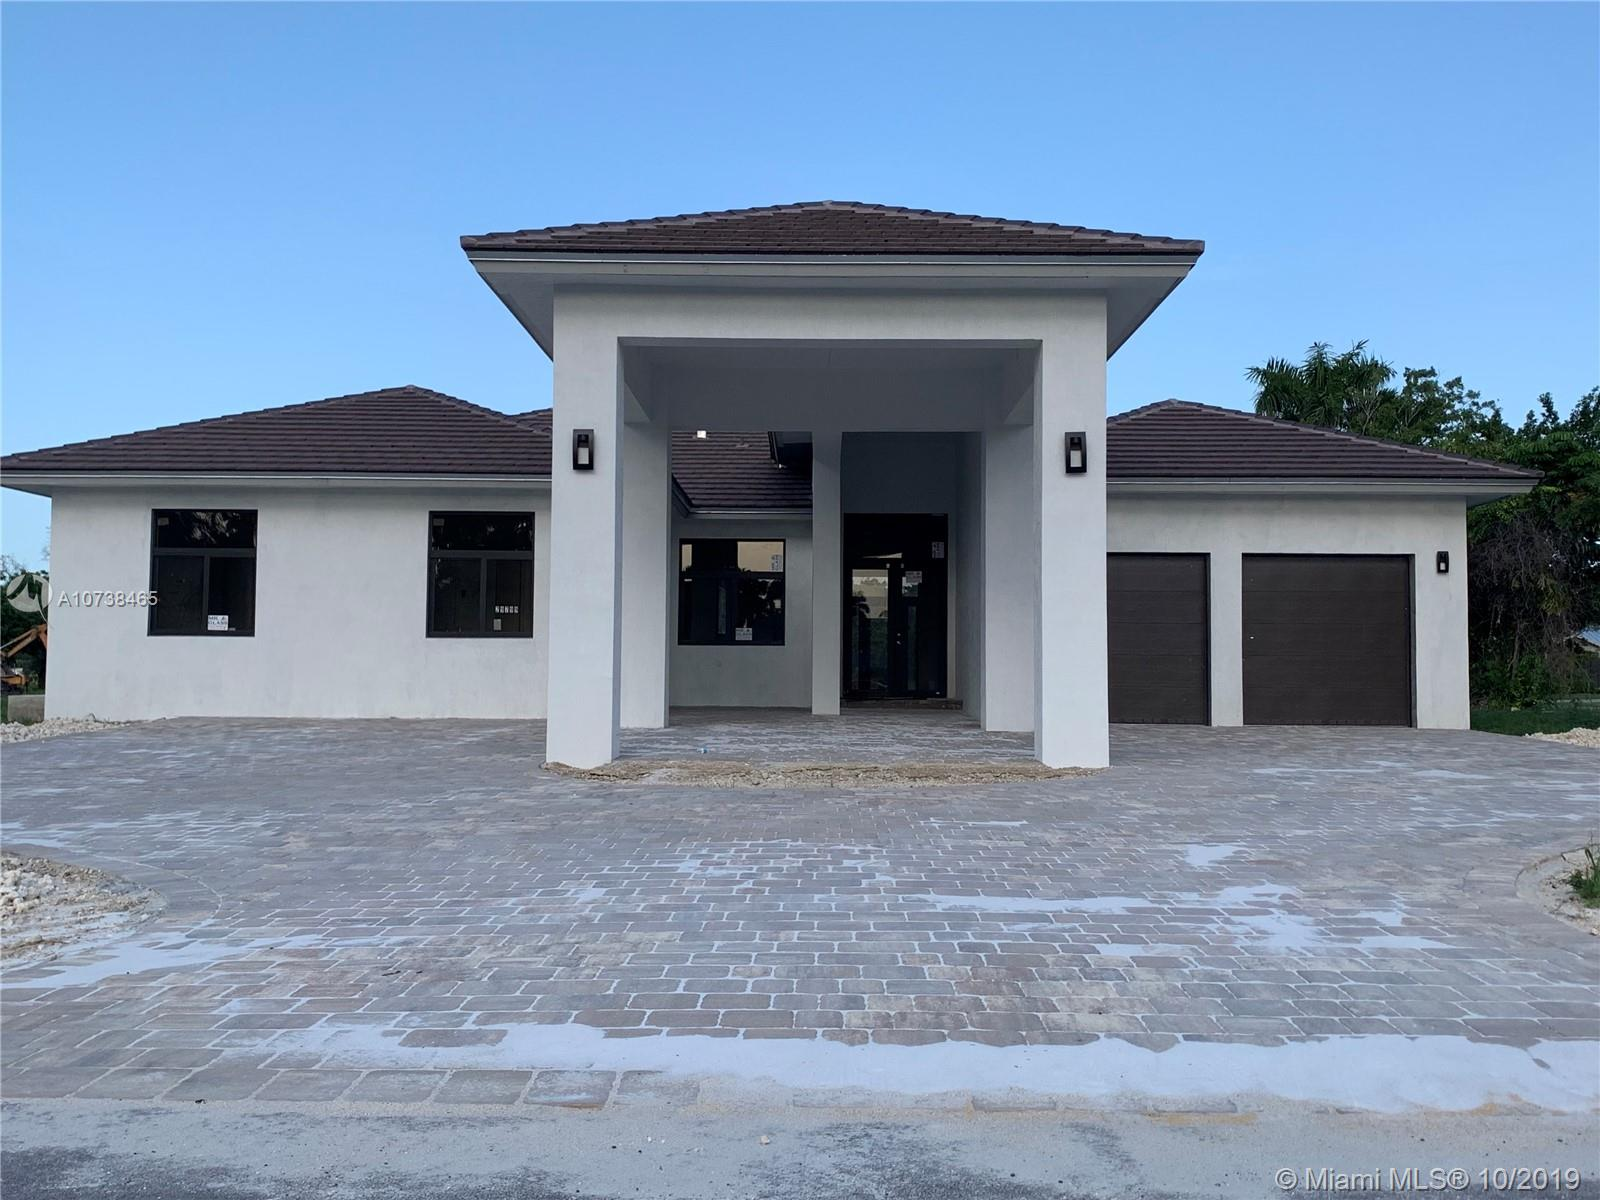 29799 SW 173 ave, Homestead, FL 33030 - Homestead, FL real estate listing